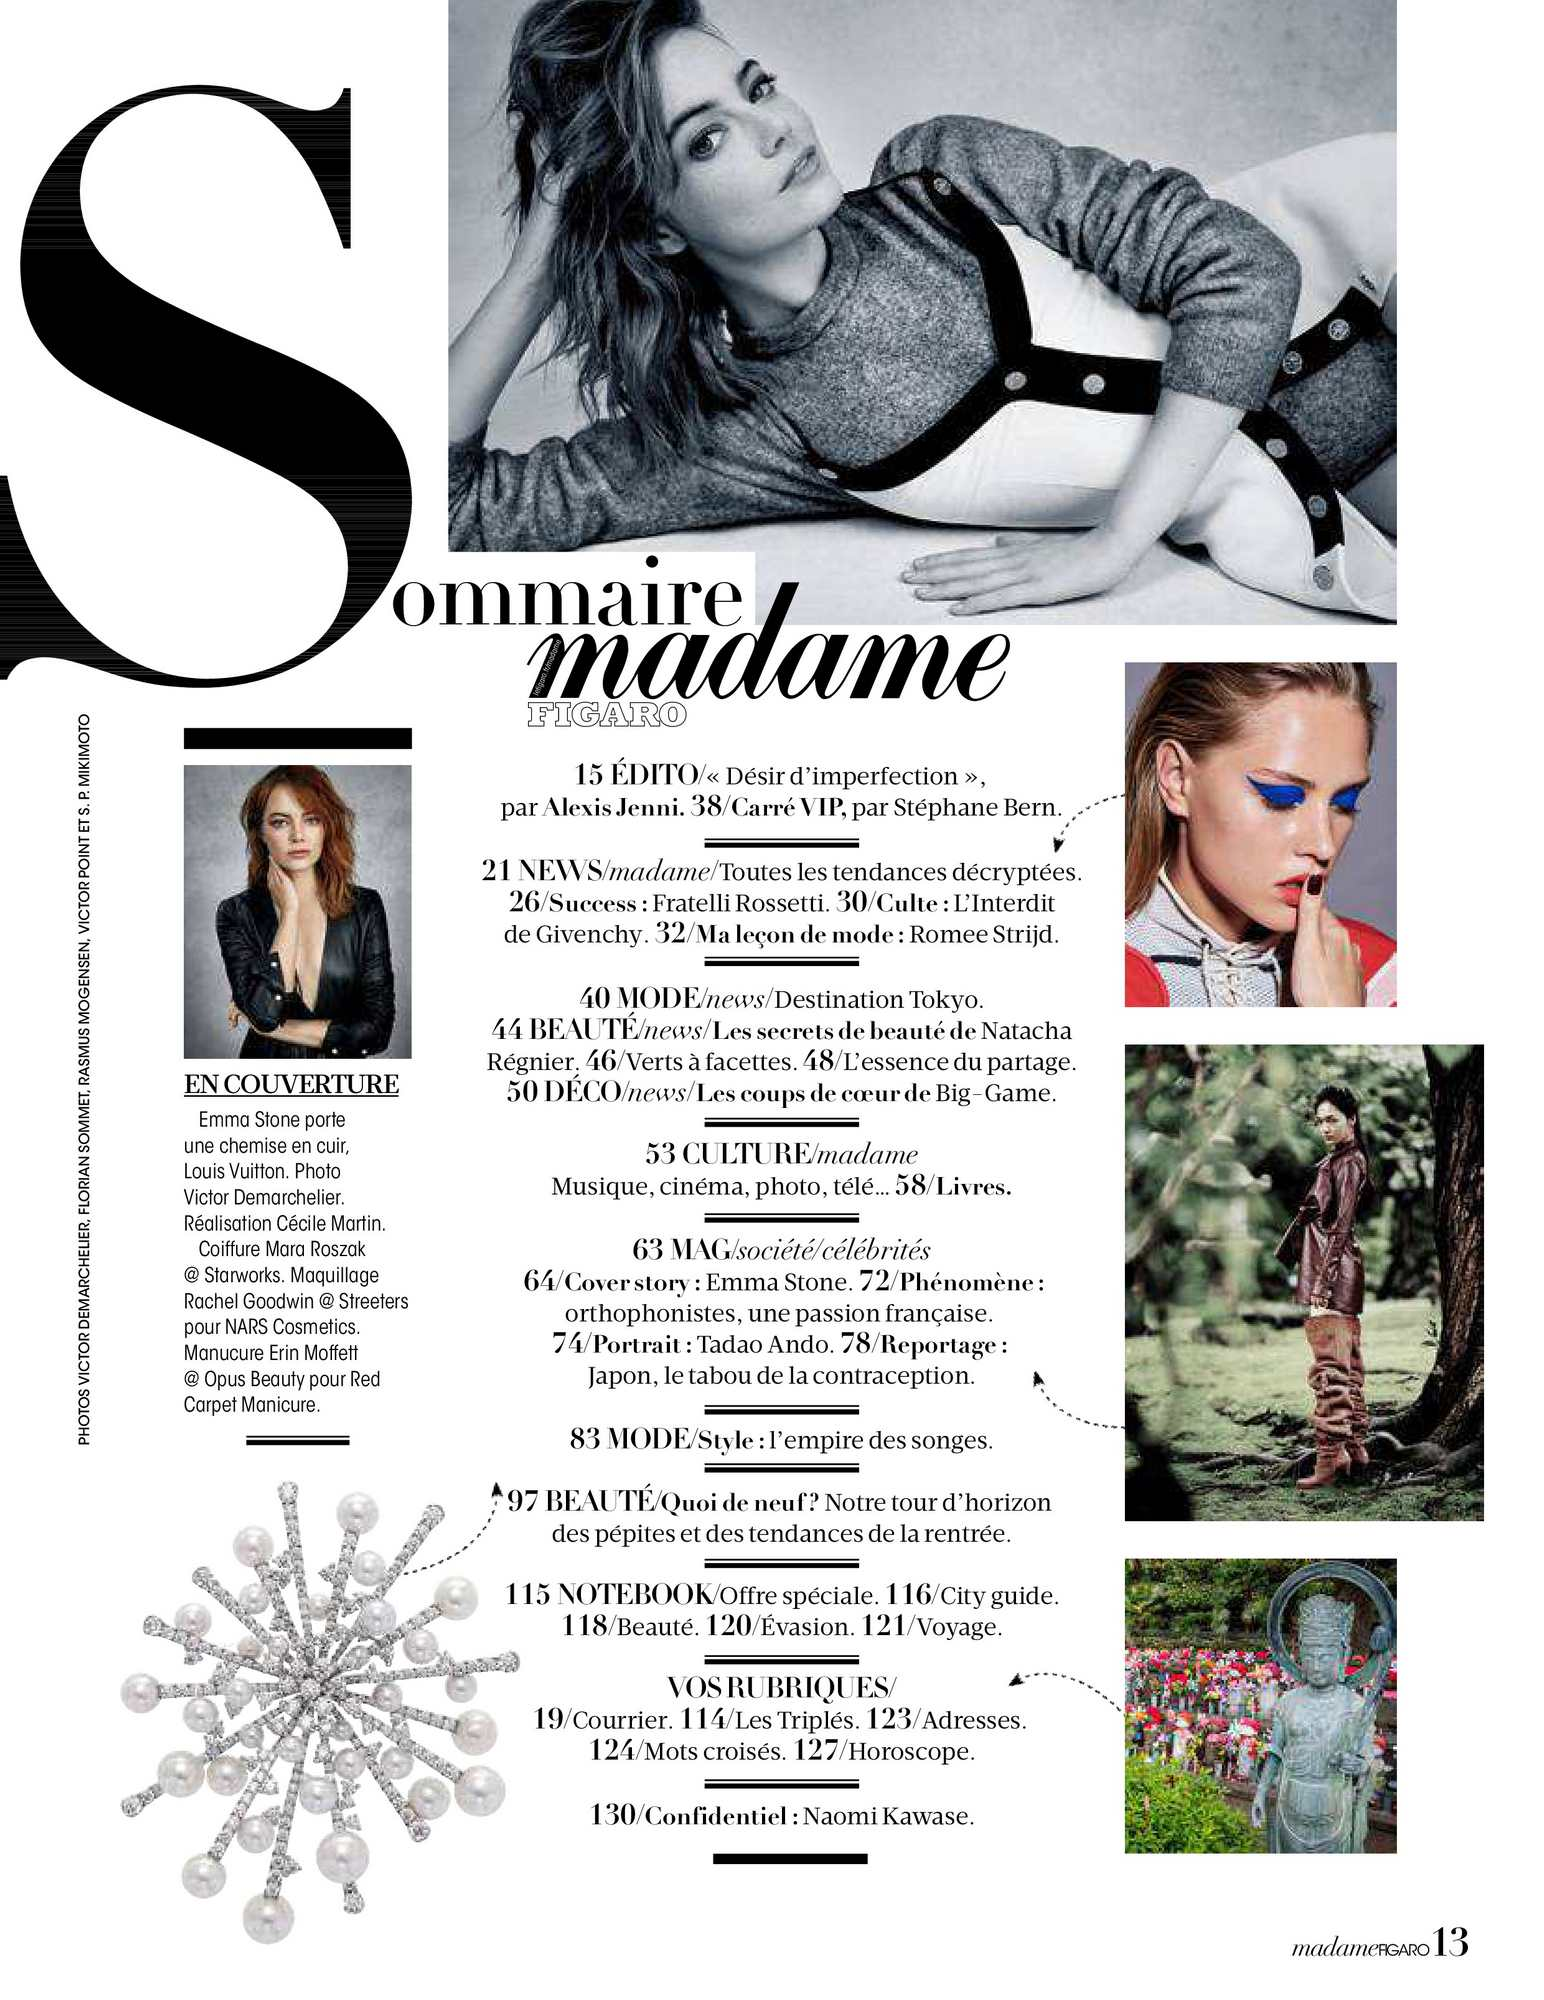 Emma-Stone-Madame-Figaro-14-September-2018061c0c973769964.jpg